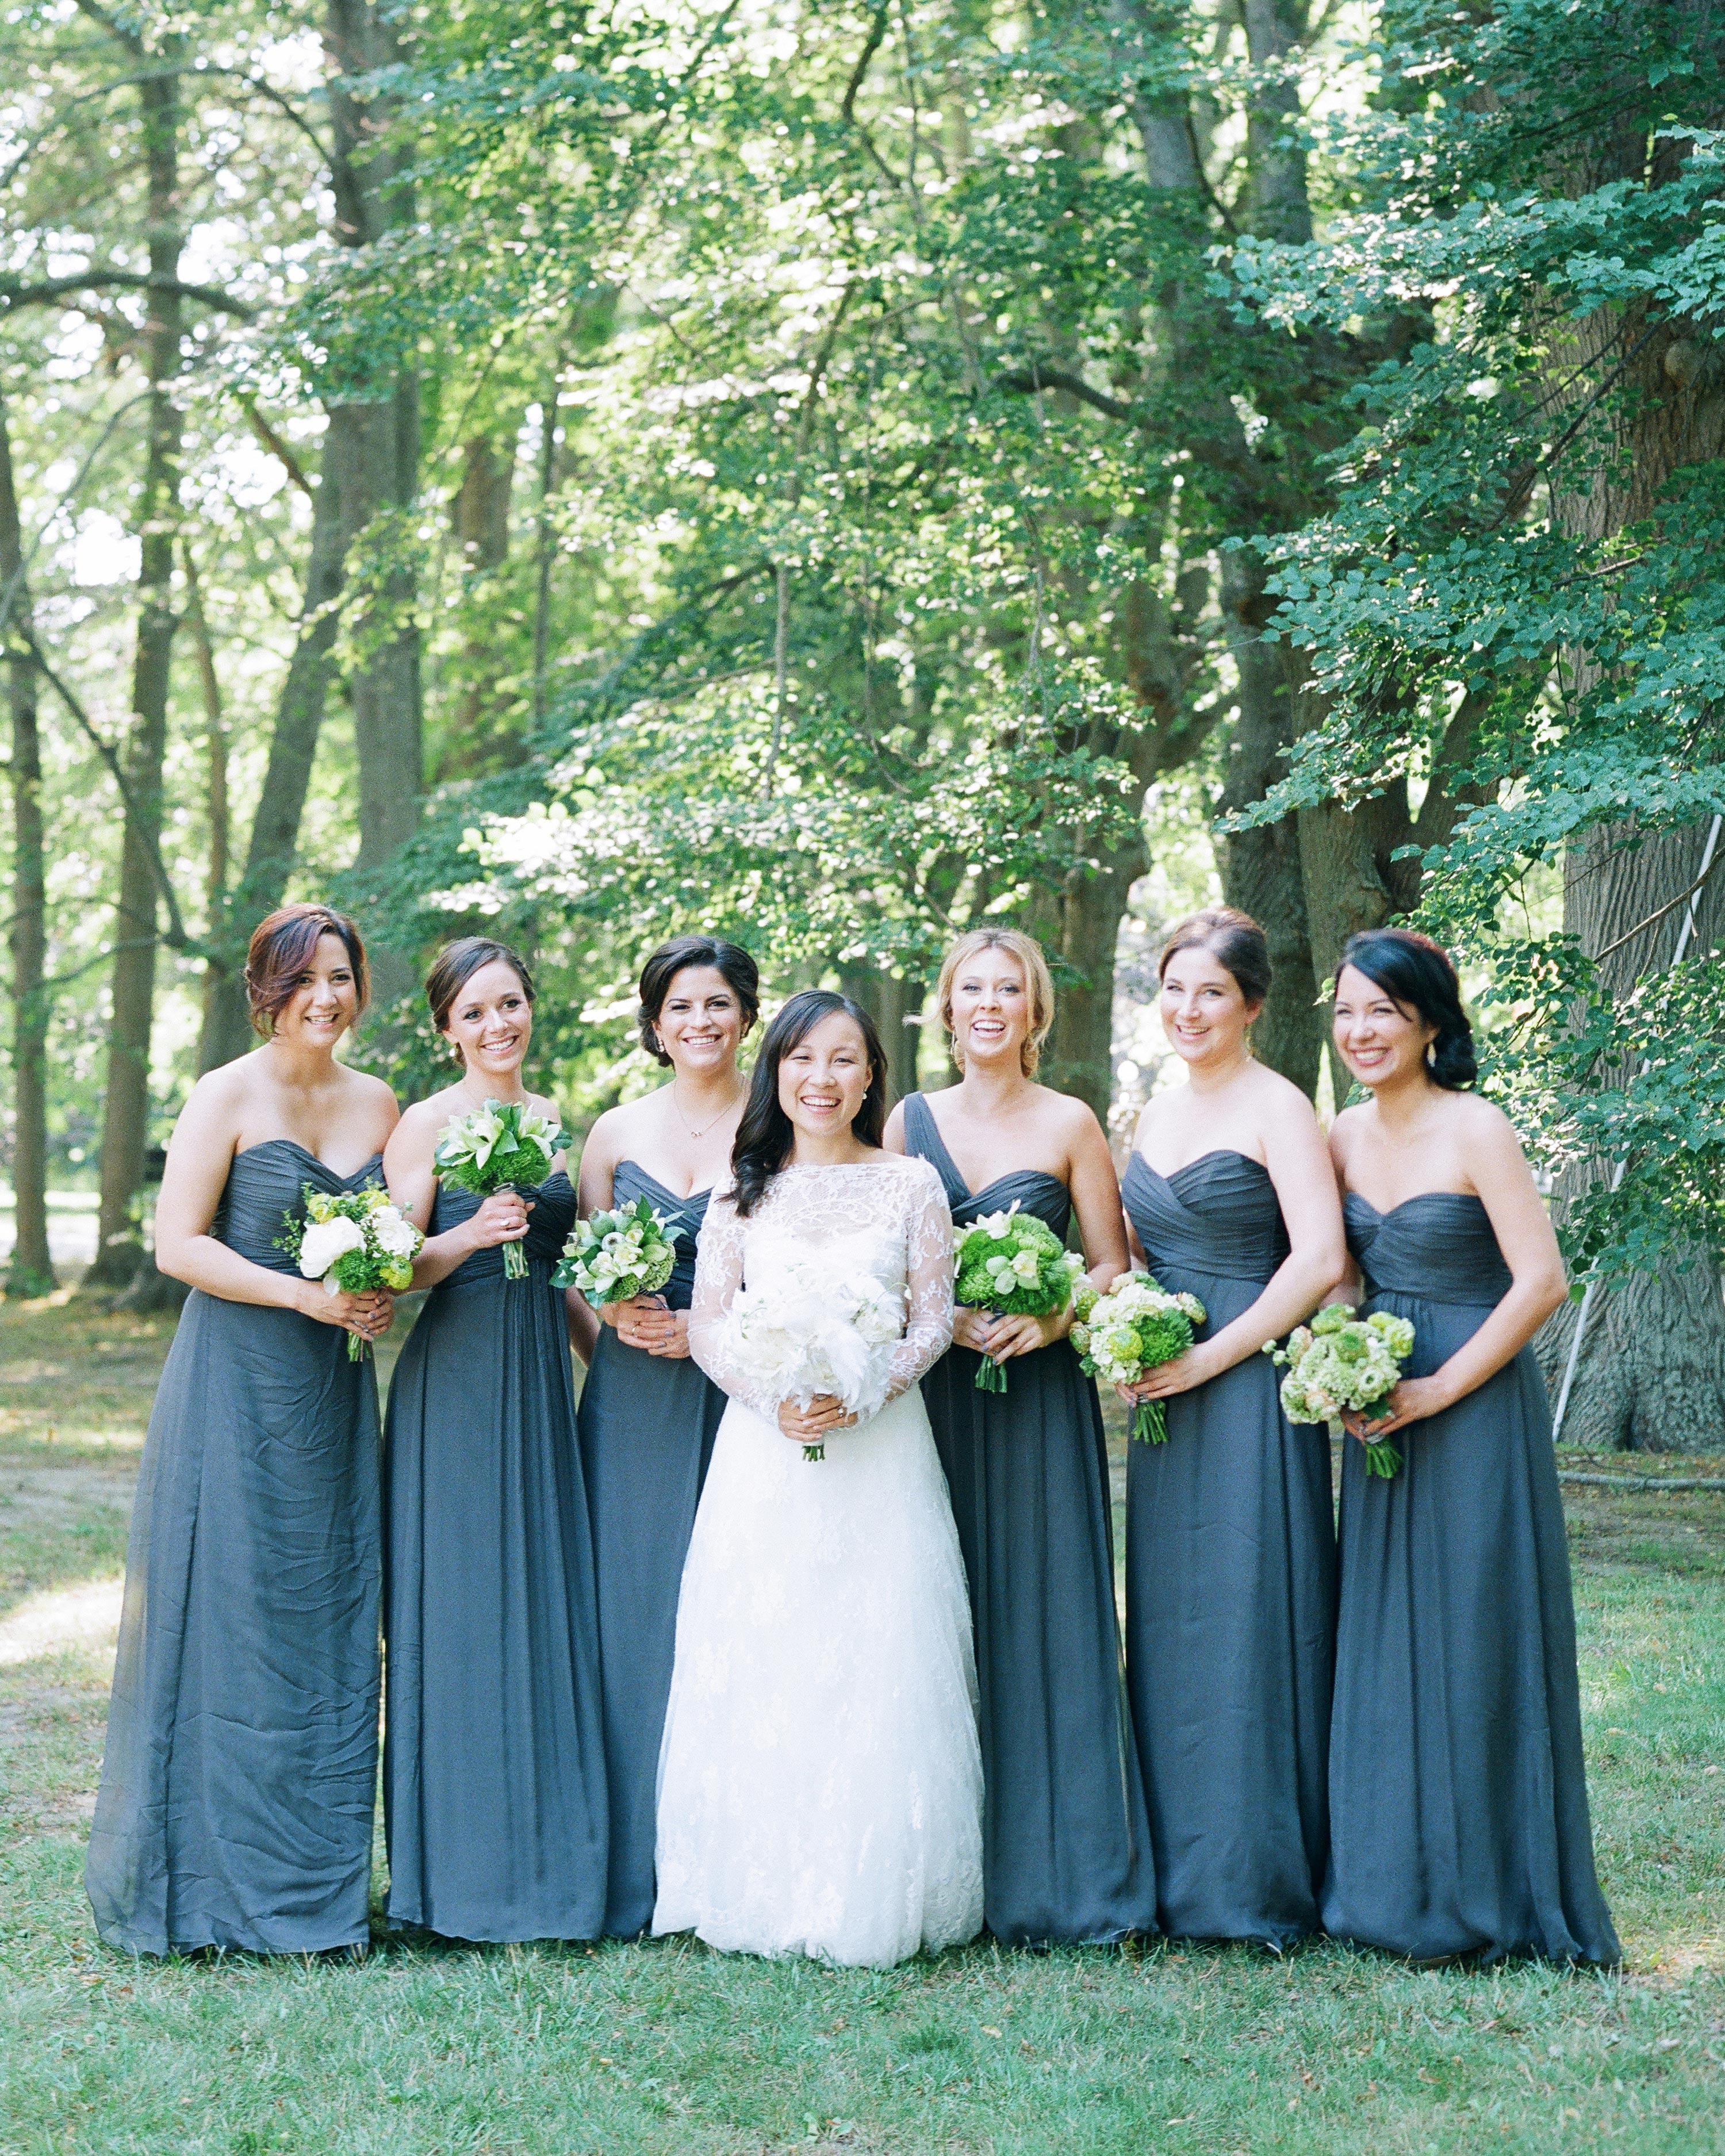 lissy-steven-wedding-newport-bridesmaids-098-elizabethmessina-s112907-0516.jpg